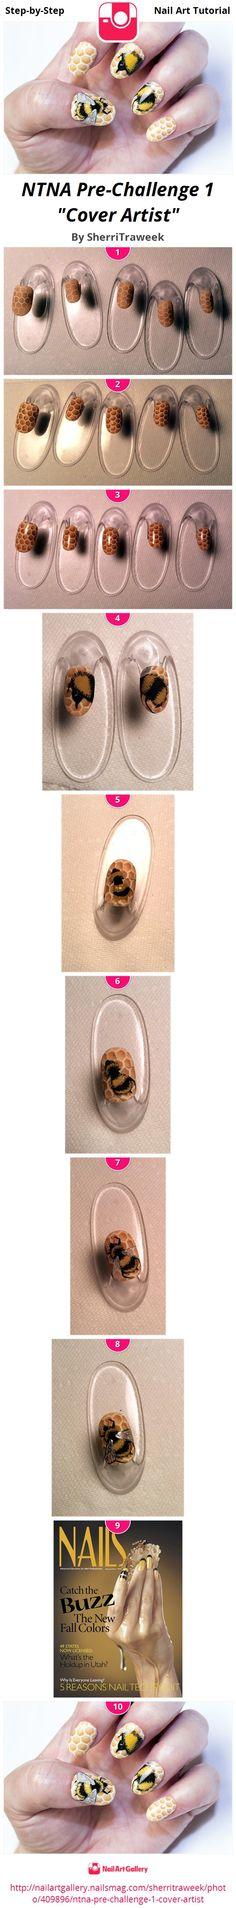 "NTNA Pre-Challenge 1 ""Cover Artist"" - Nail Art Gallery Step-by-Step Tutorial Photos"